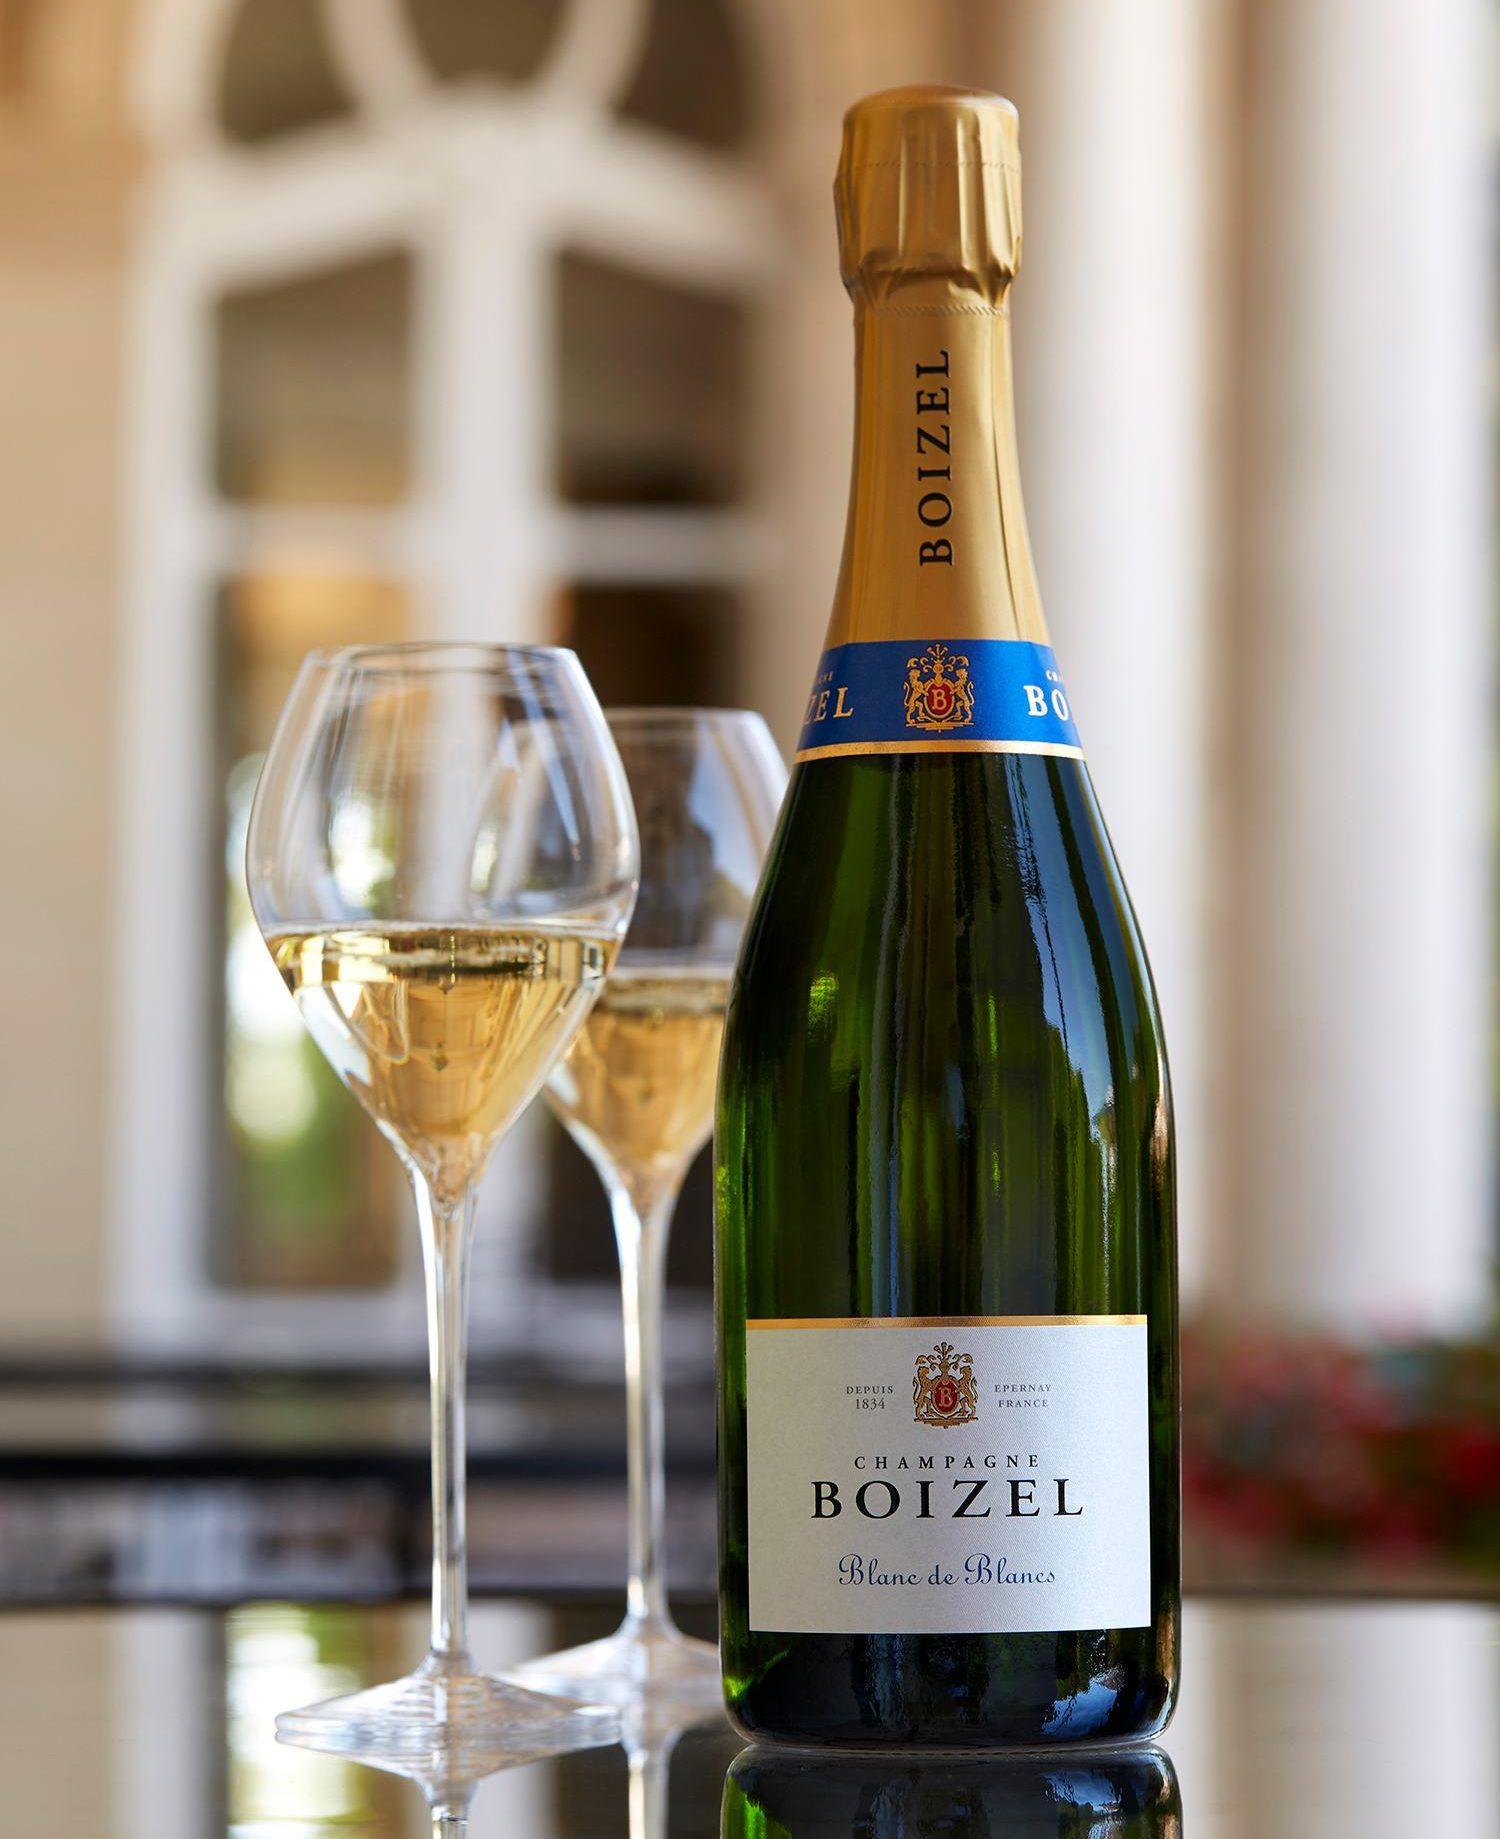 Blanc de Blancs - Champagne Boizel - Epernay France